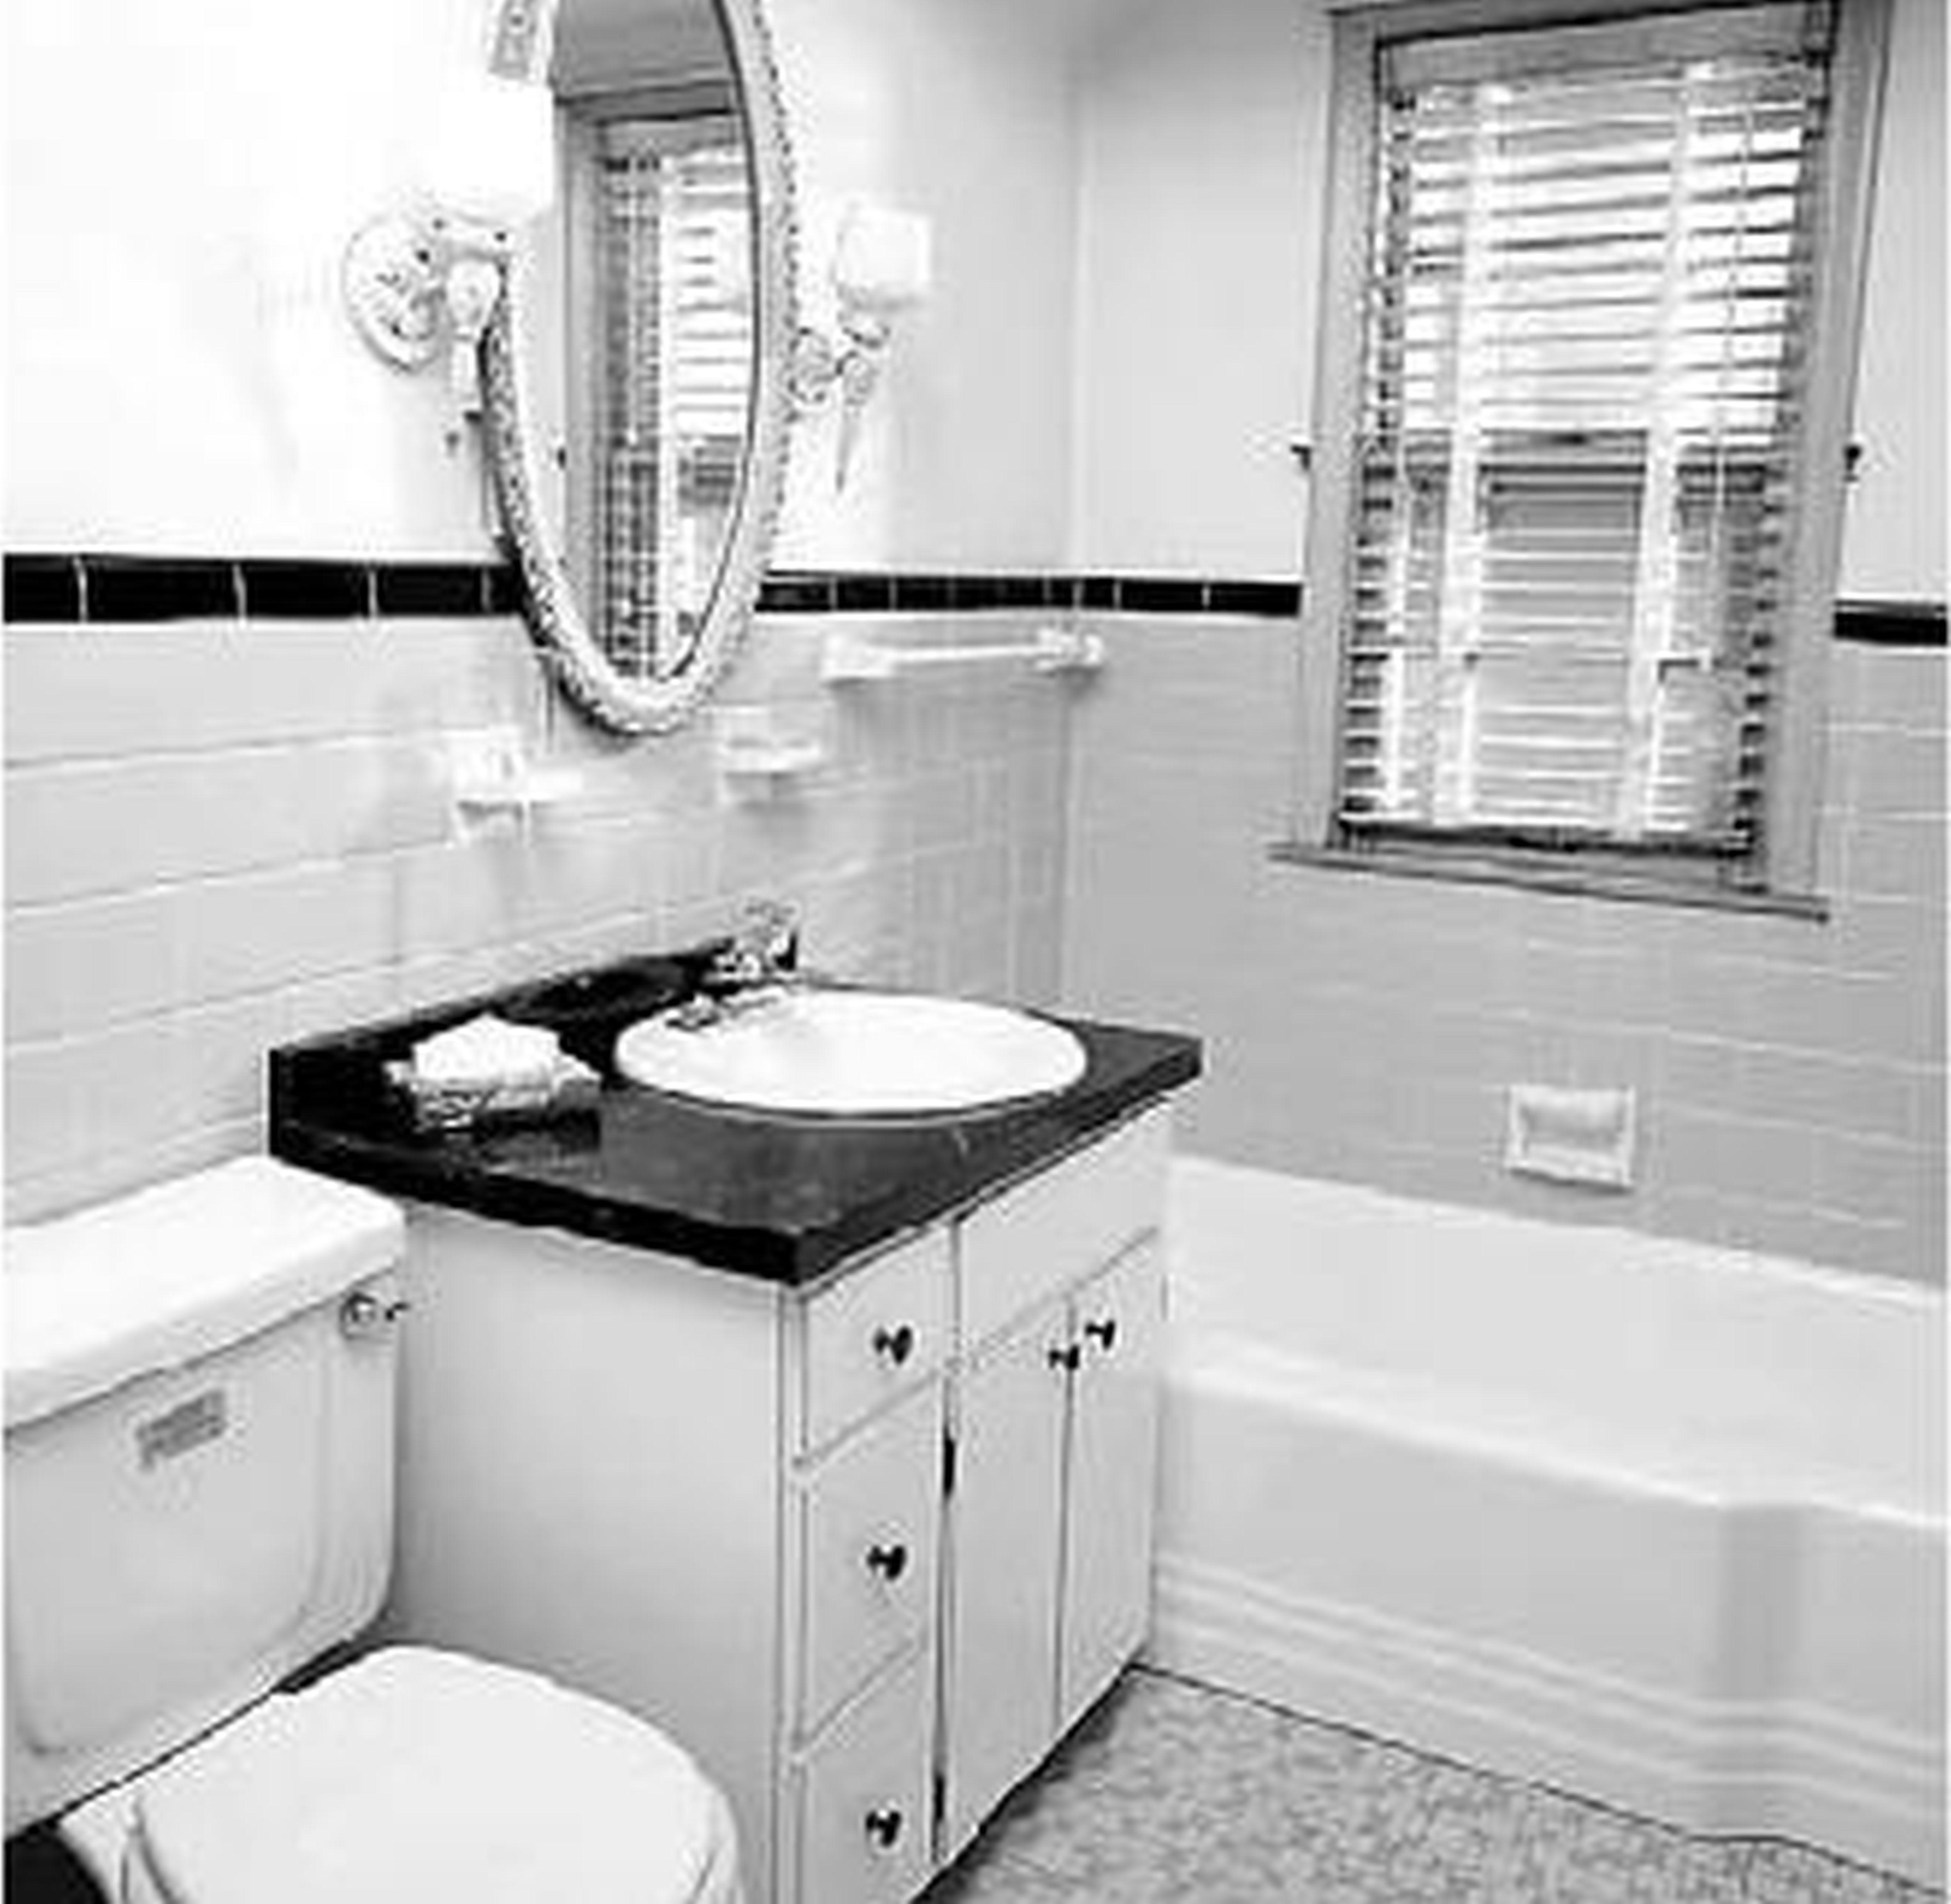 Cozy Bathroom Sink Drain Assembly Ideas Black And White Bathroom